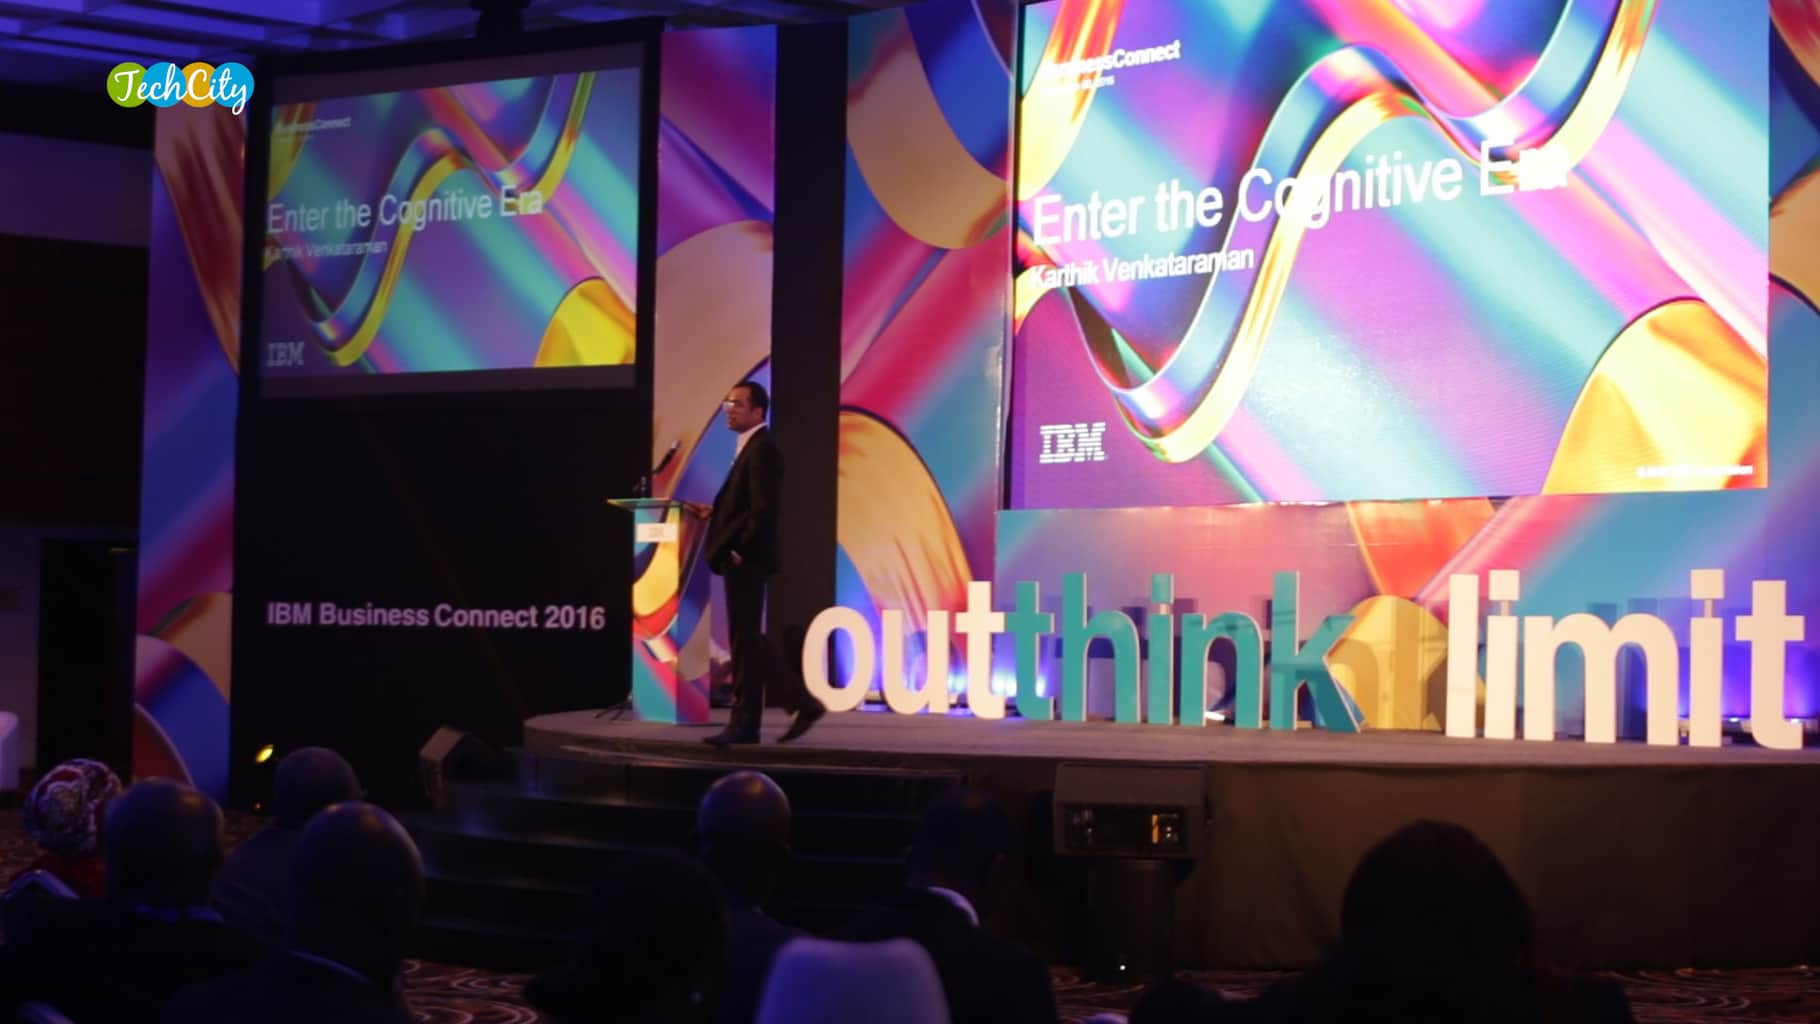 Karthik Venkataraman, Cognitive Thinking, IBM